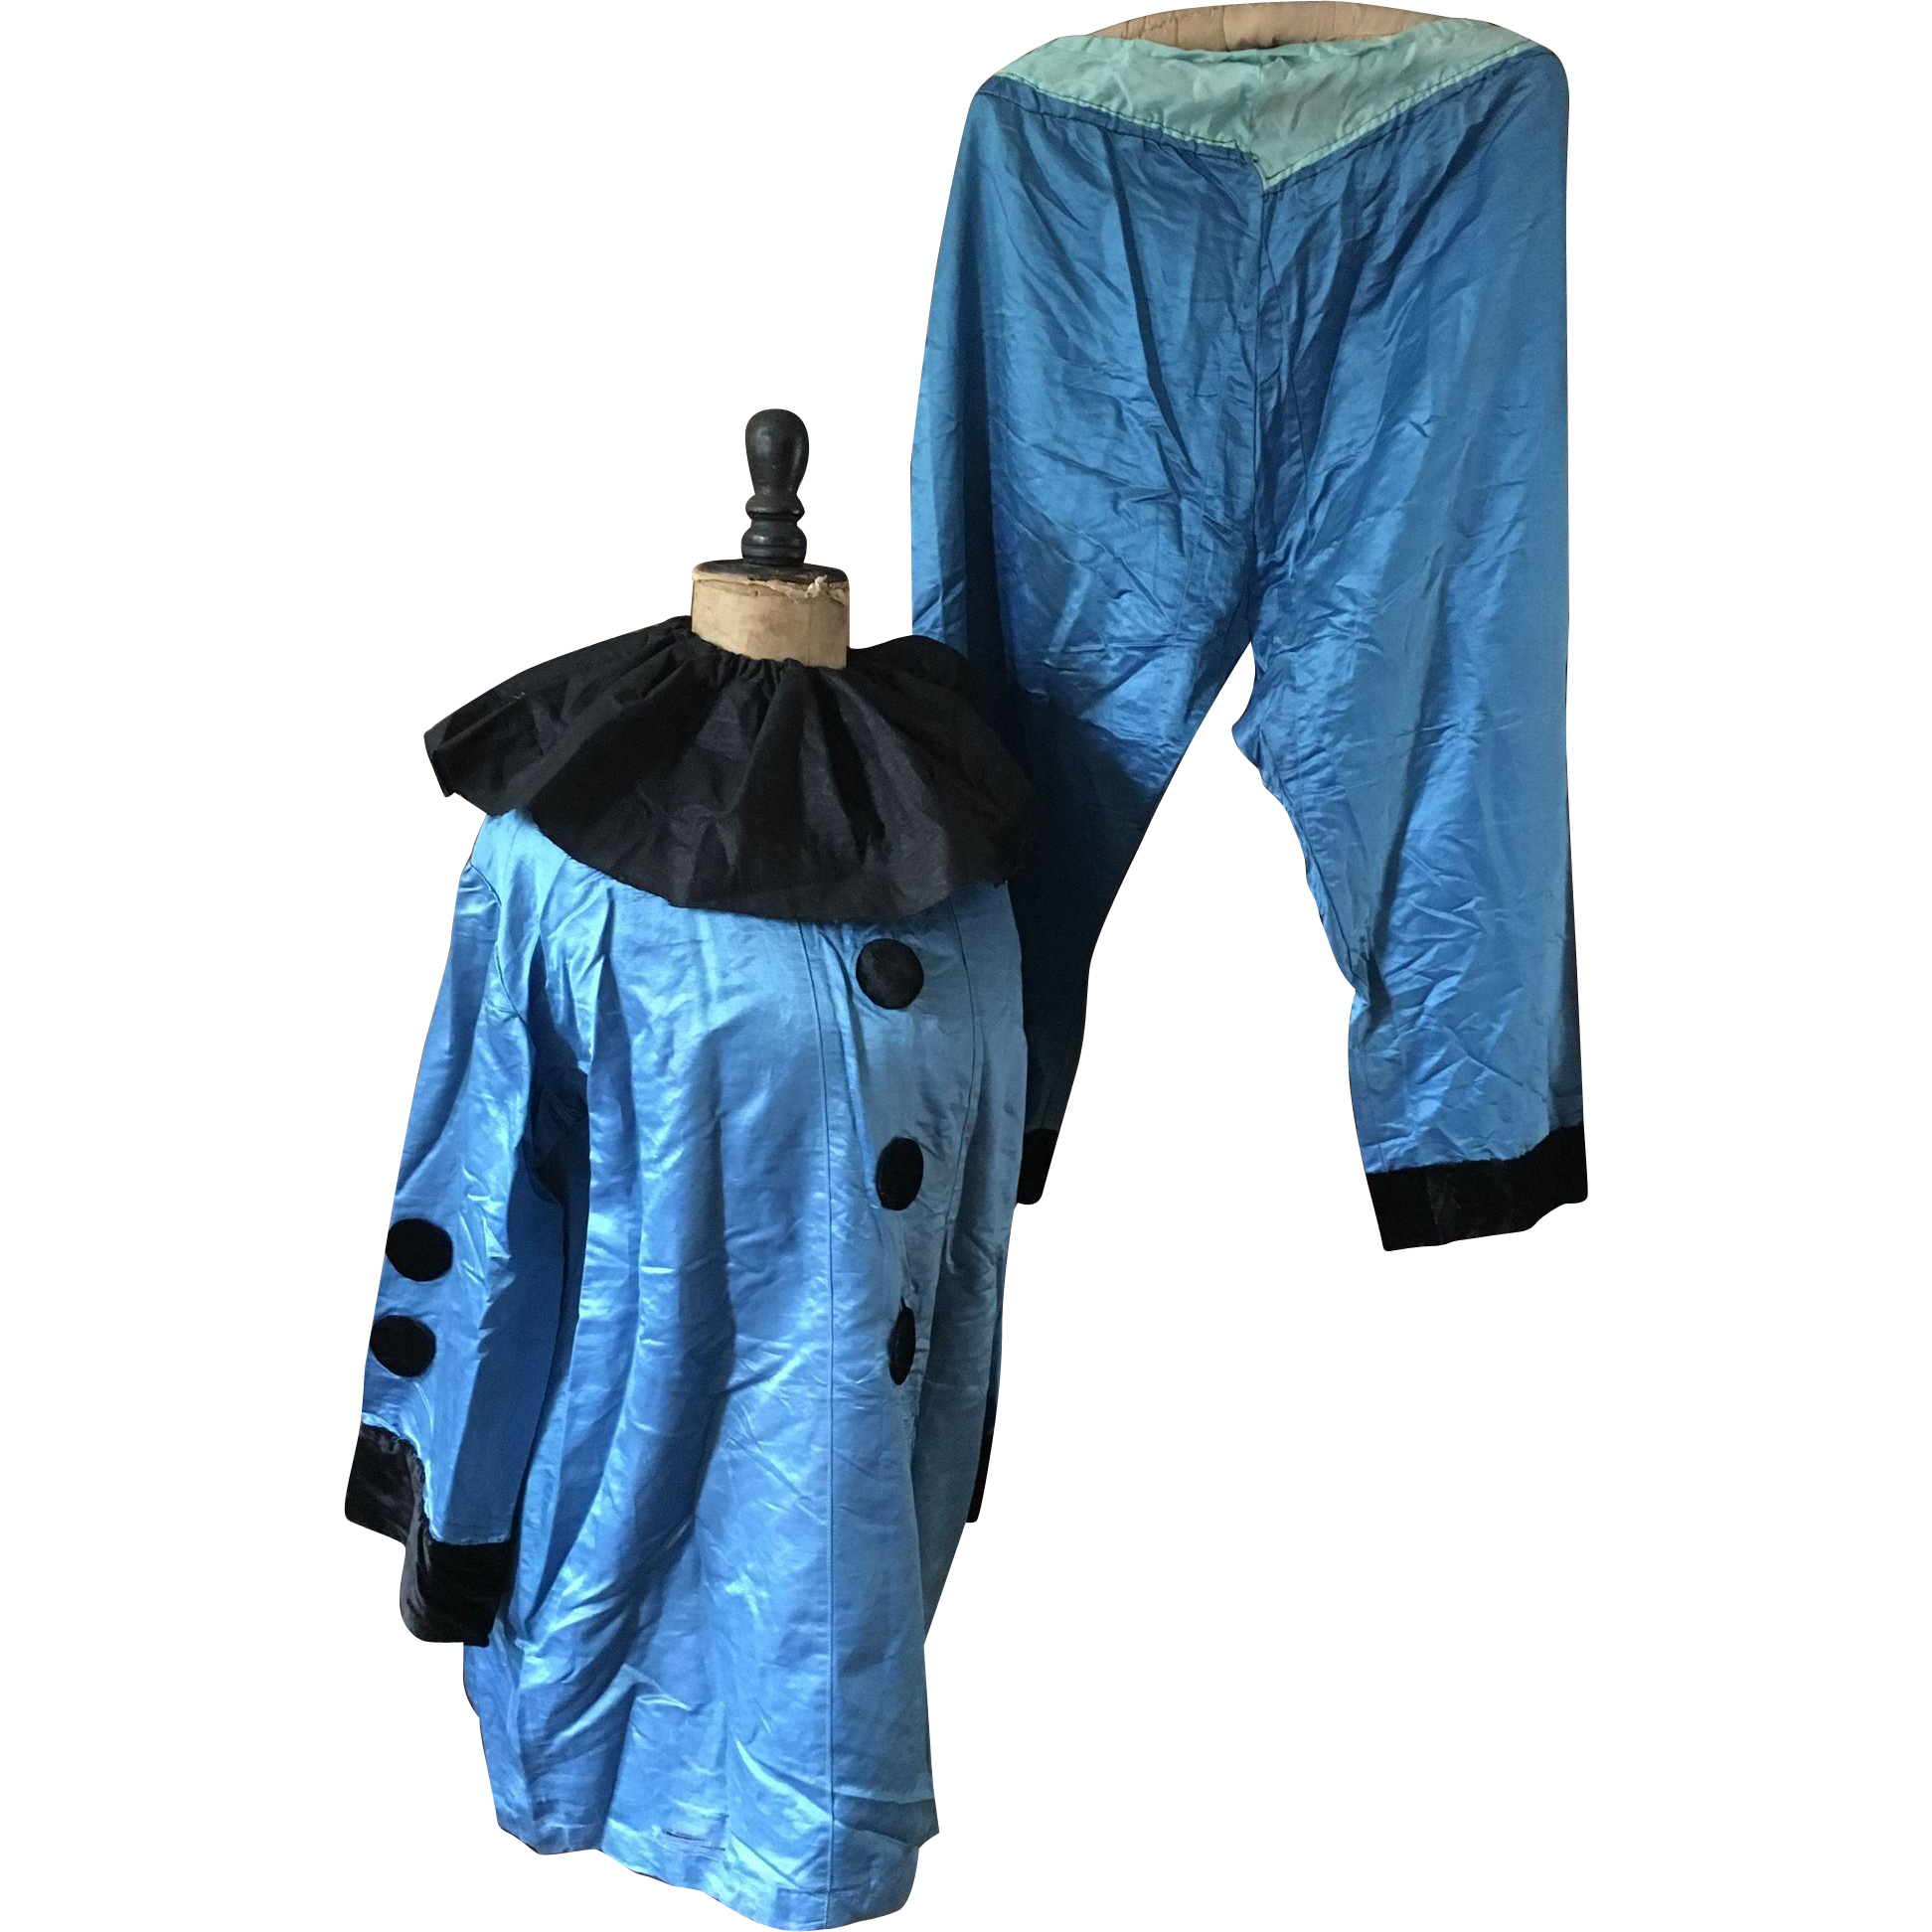 Pierrot Costume, Blue with Collar - Circa 1920's/30's